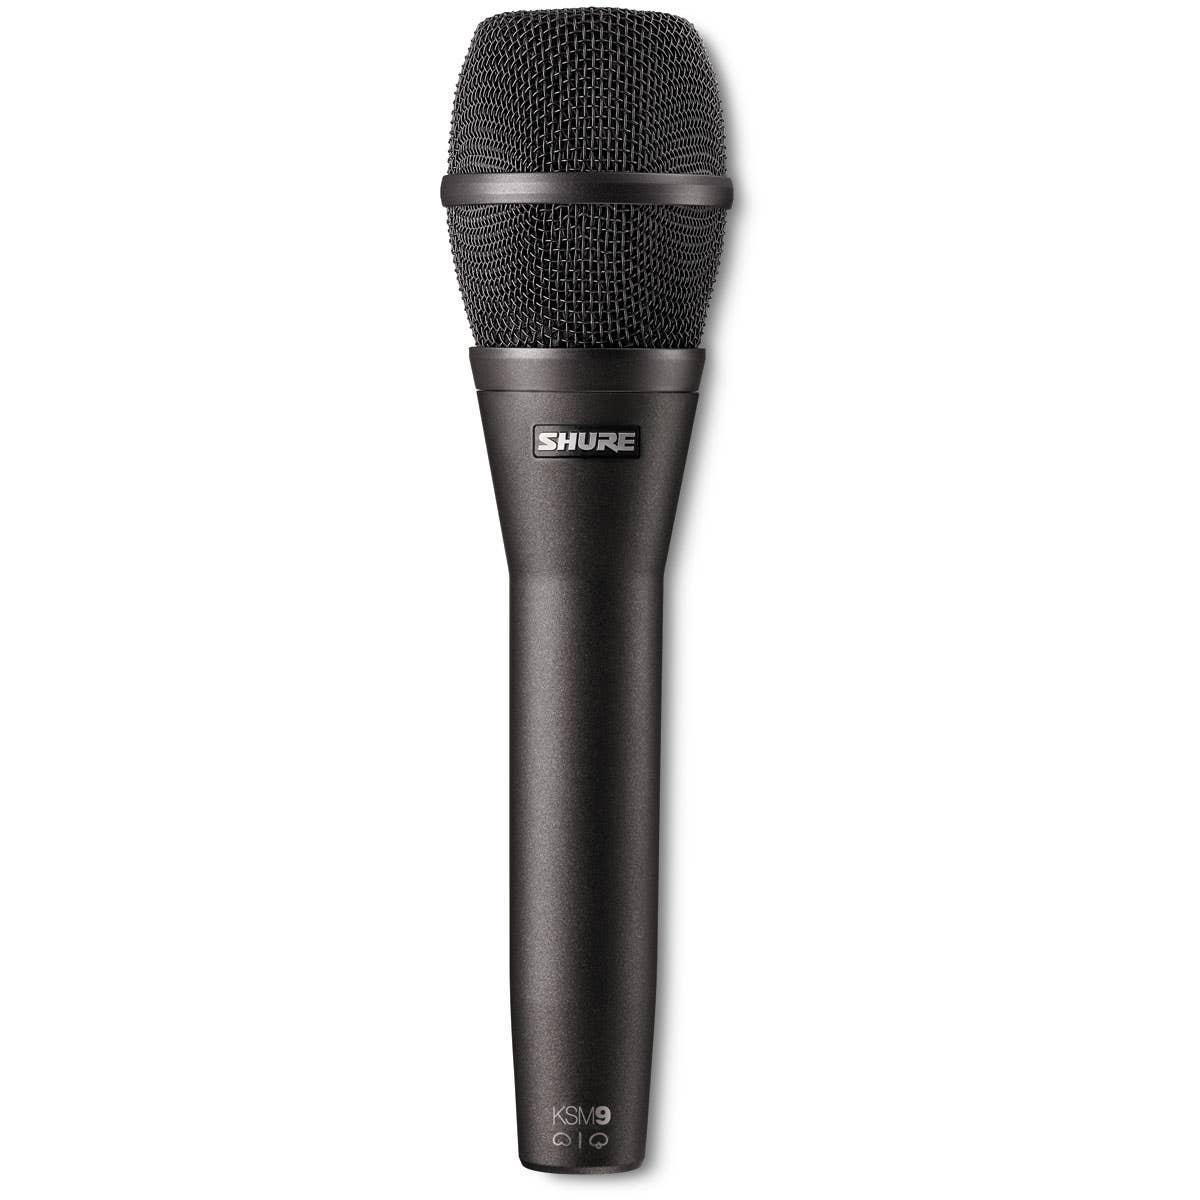 Shure KSM9 Handheld Vocal Microphone - Charcoal Grey